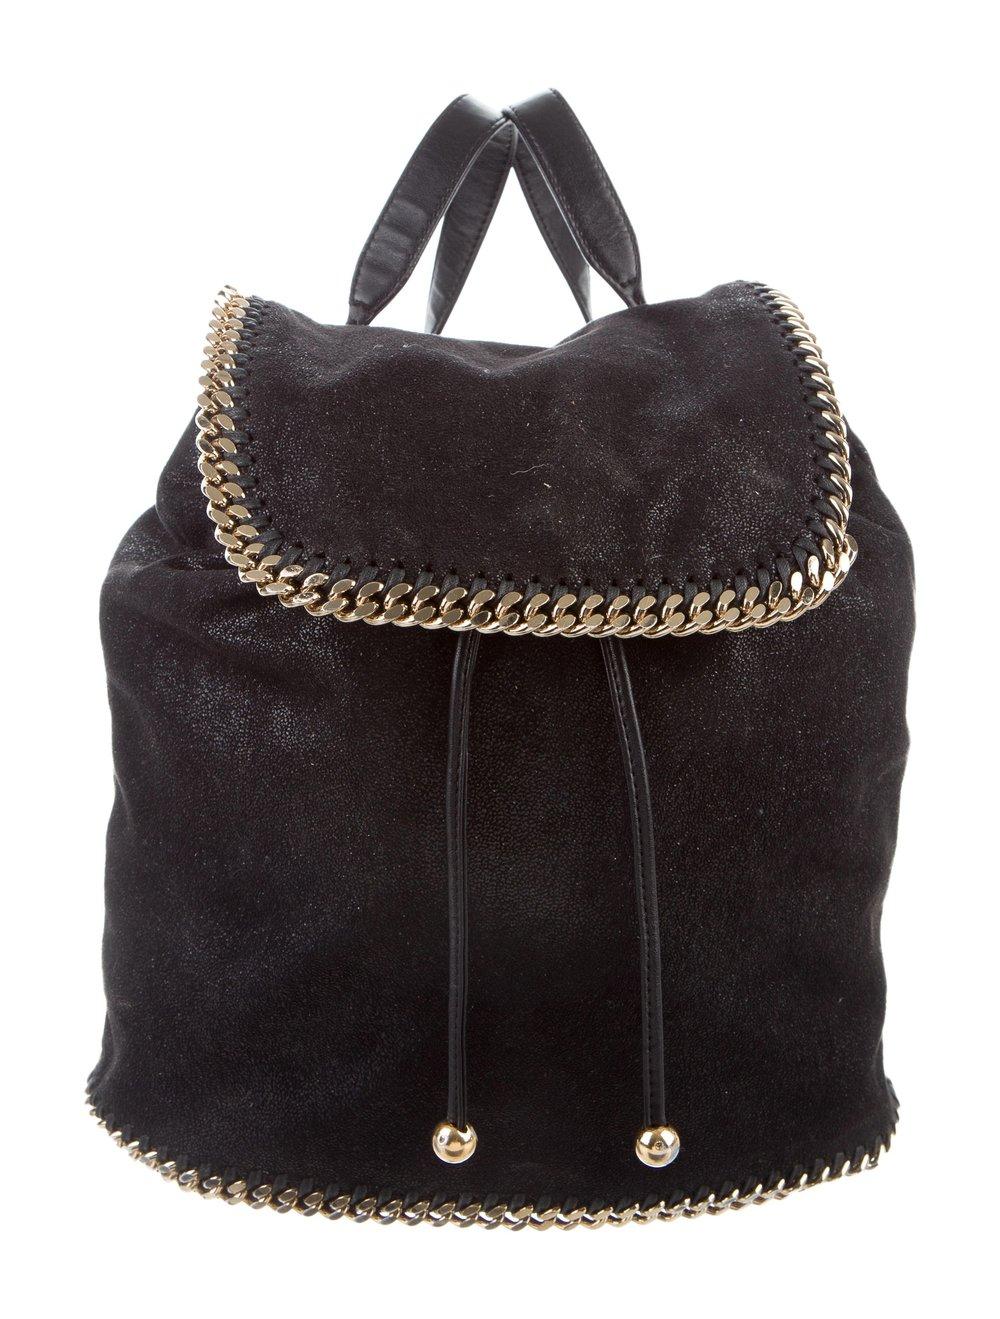 STELLA MCCARTNEY    Falabella Shaggy Deer Backpack, $596, therealreal.com